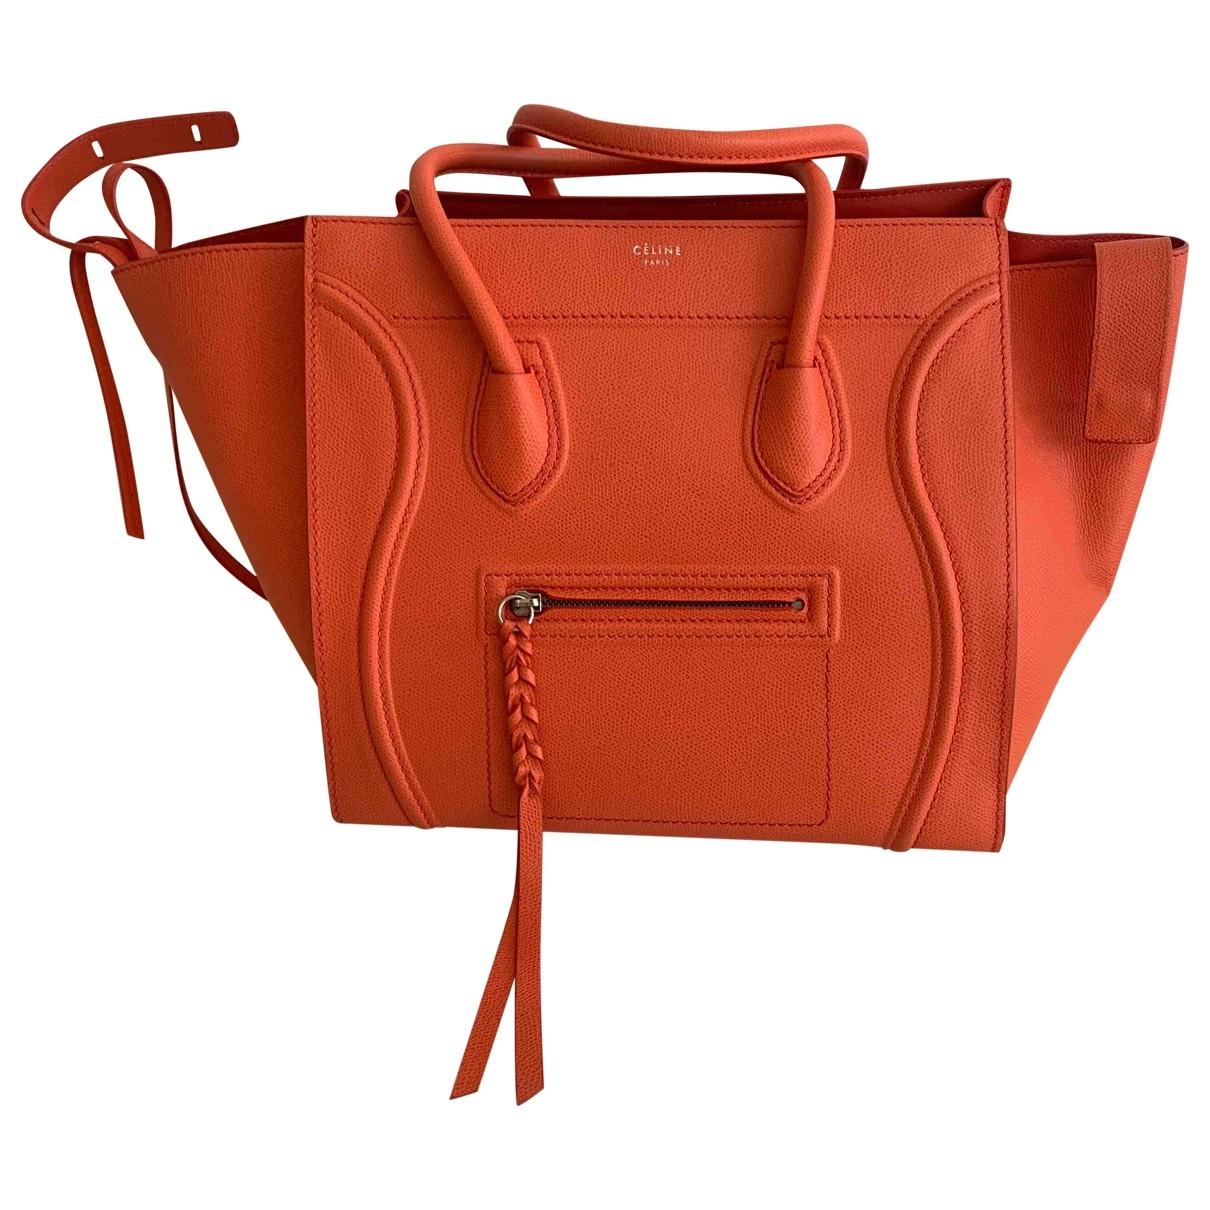 Celine Luggage Phantom Orange Leather handbag for Women \N